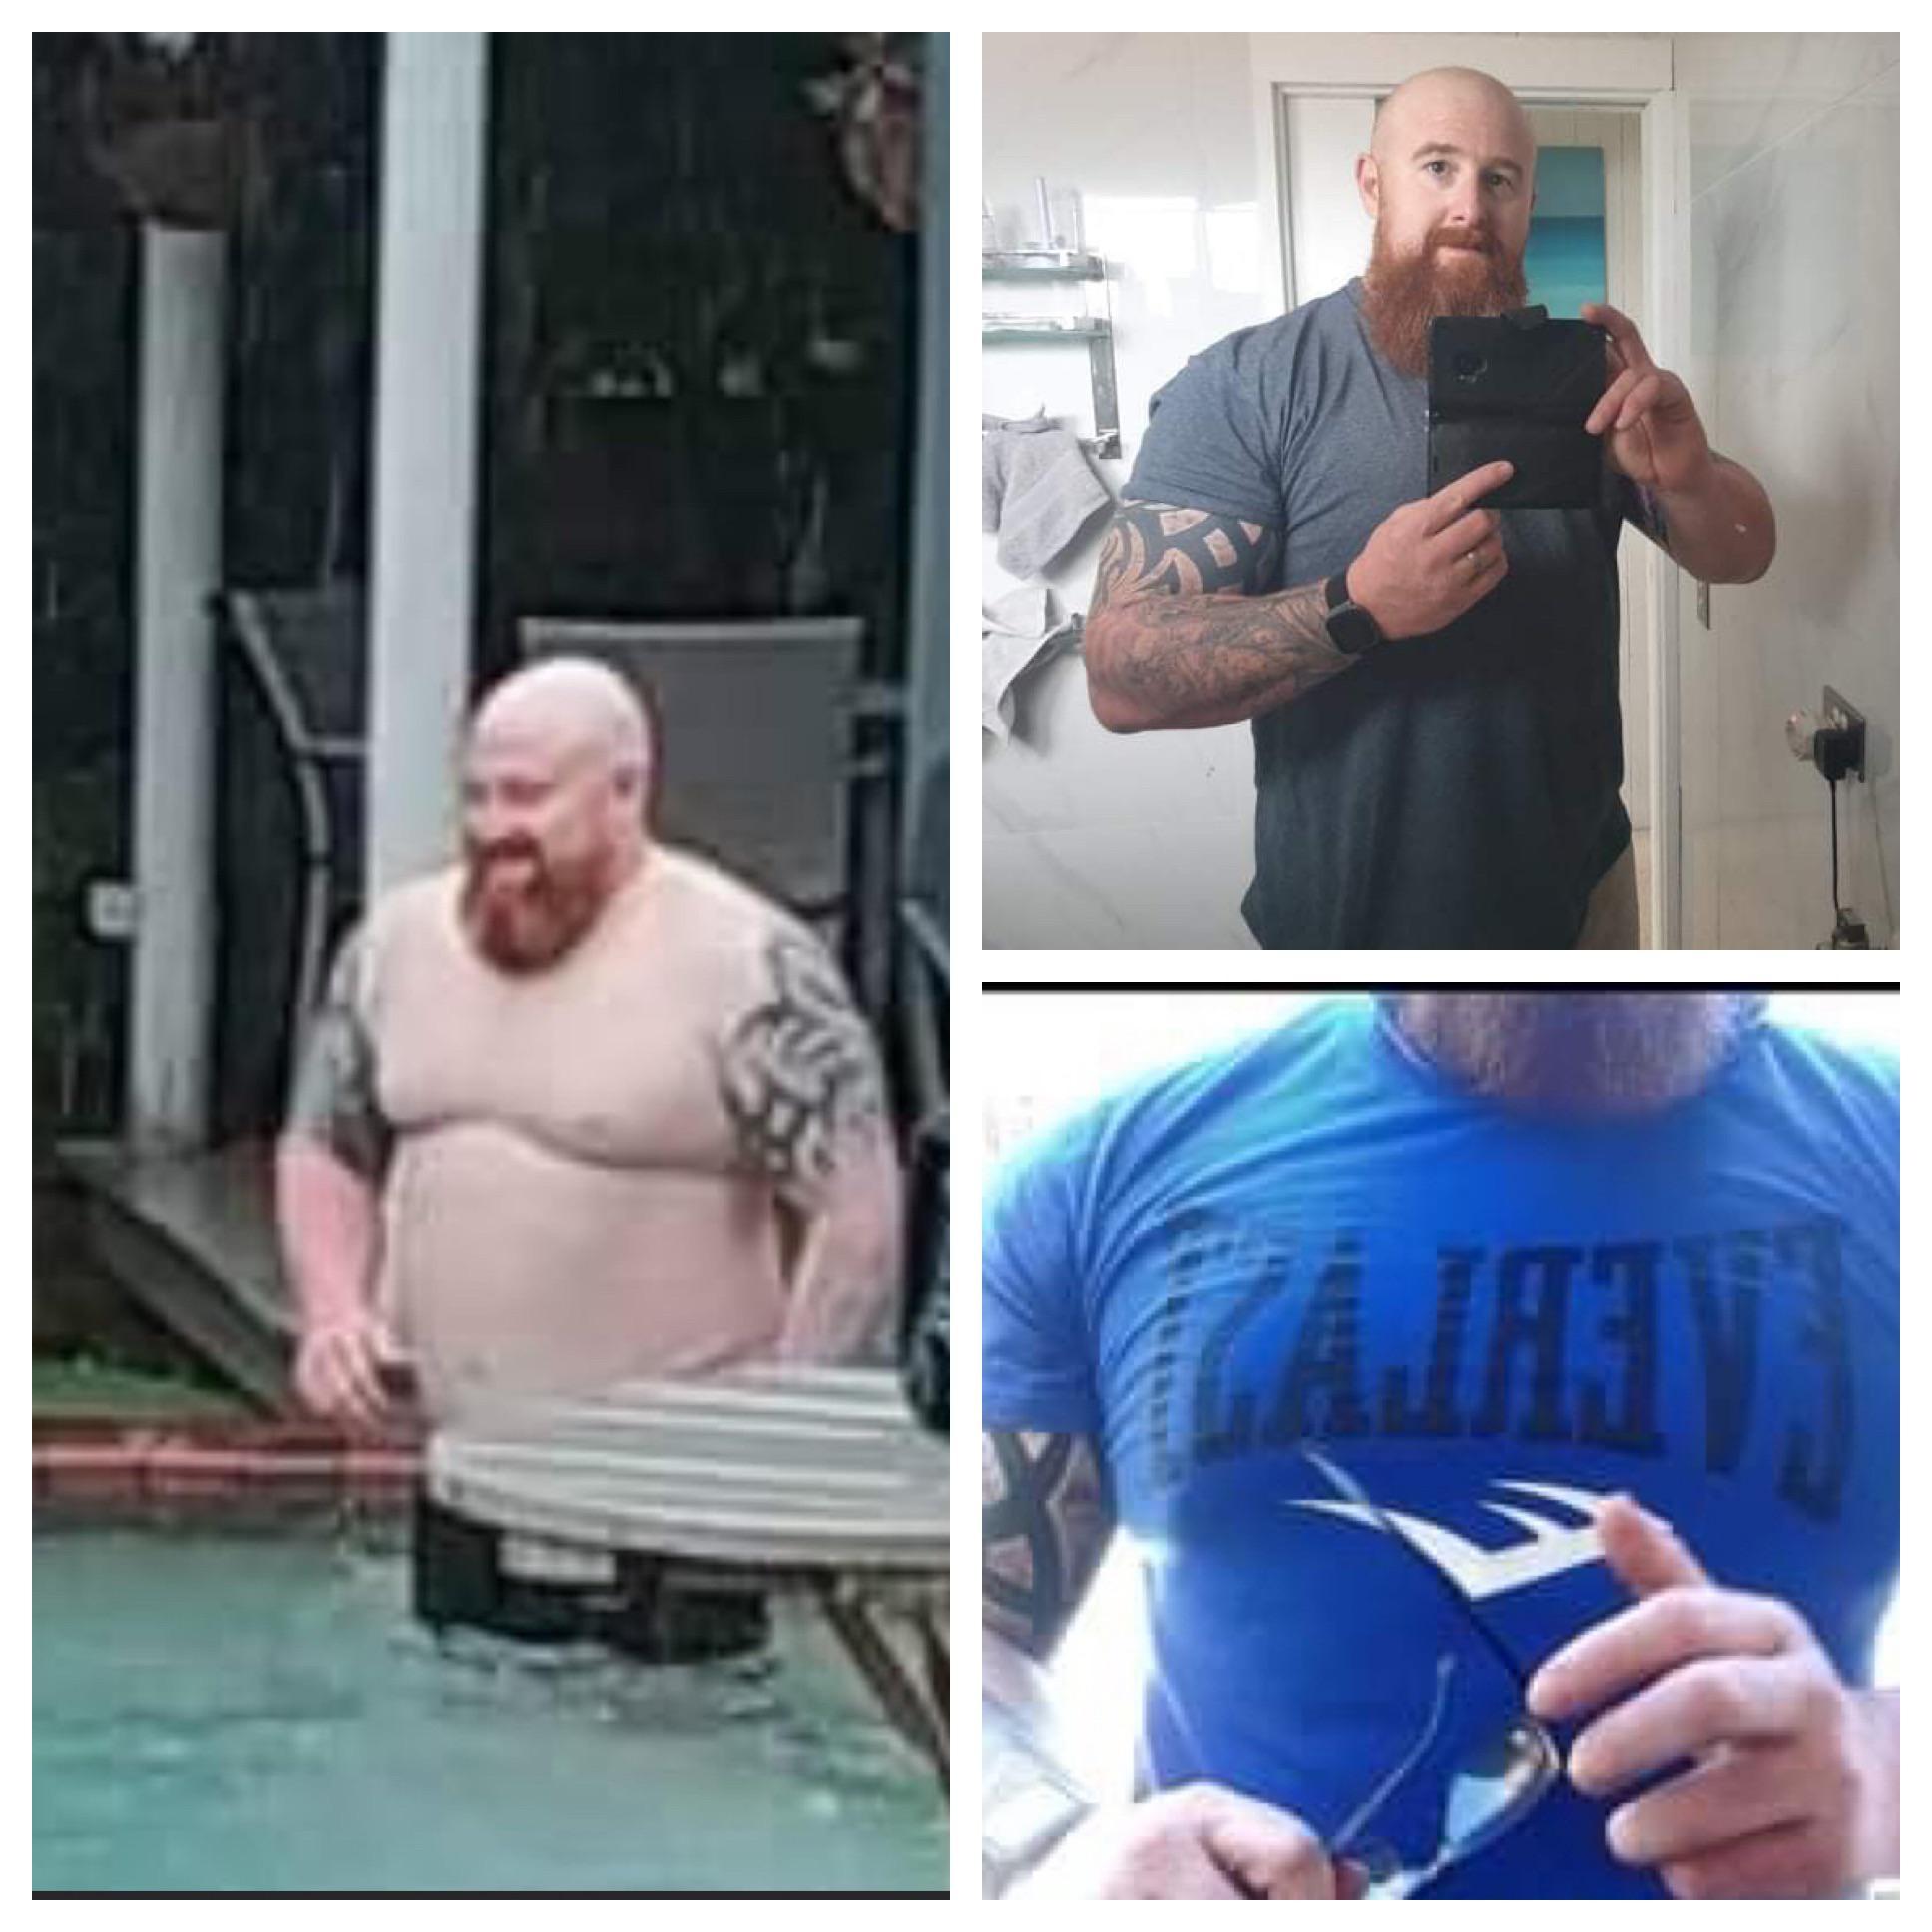 6 feet 2 Male Progress Pics of 62 lbs Weight Loss 327 lbs to 265 lbs